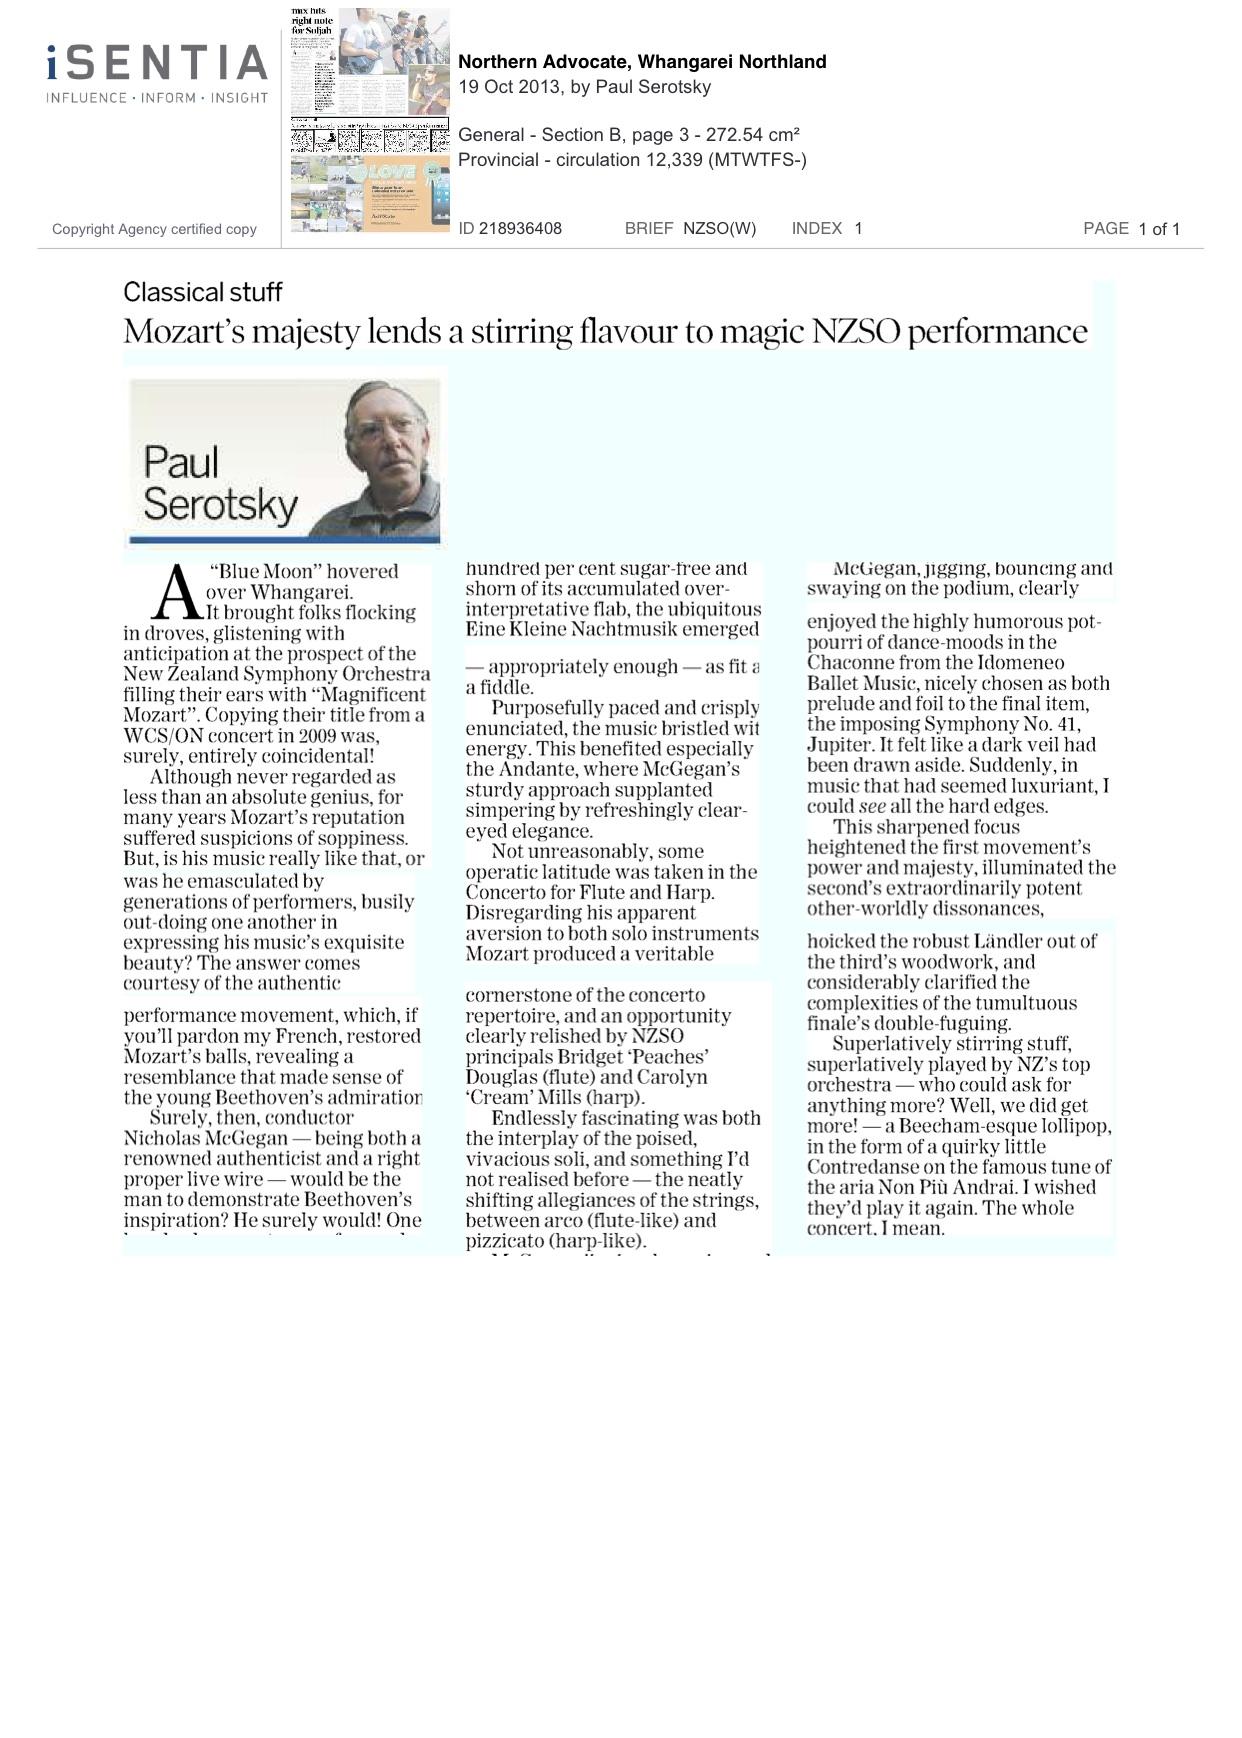 Northern-Advocate.Whangarei.MagMozart.Review.19.10.13